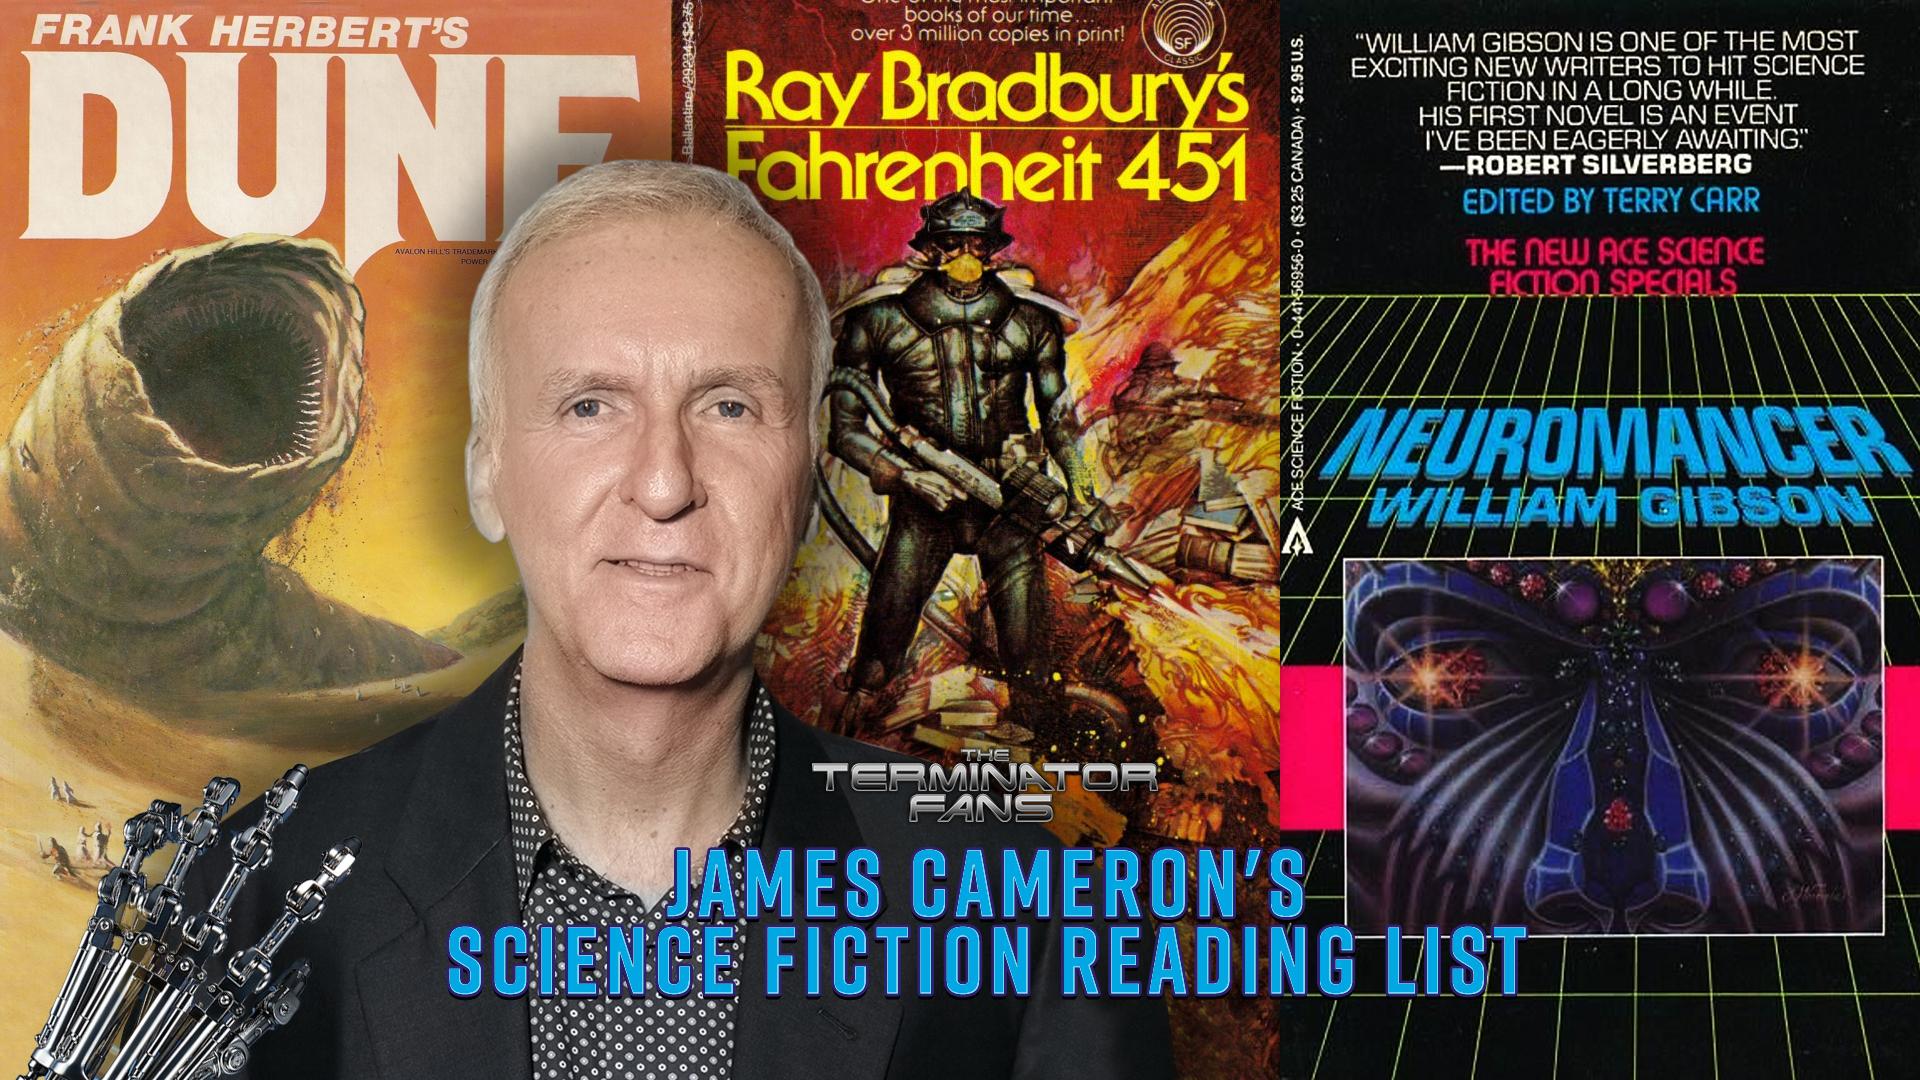 James Cameron's Science Fiction Reading List - Favorite Sci-Fi Novels